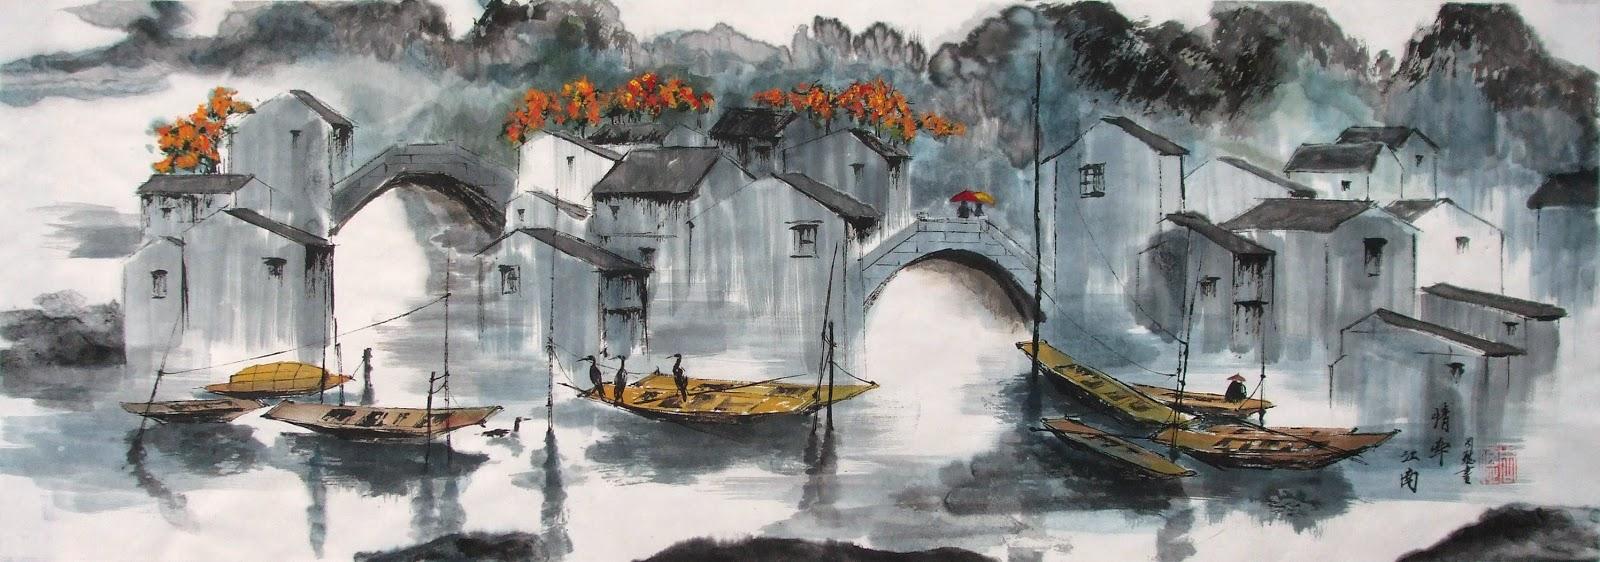 Zhou cong peinture et calligraphie chinoise peinture for Miroir 90x30